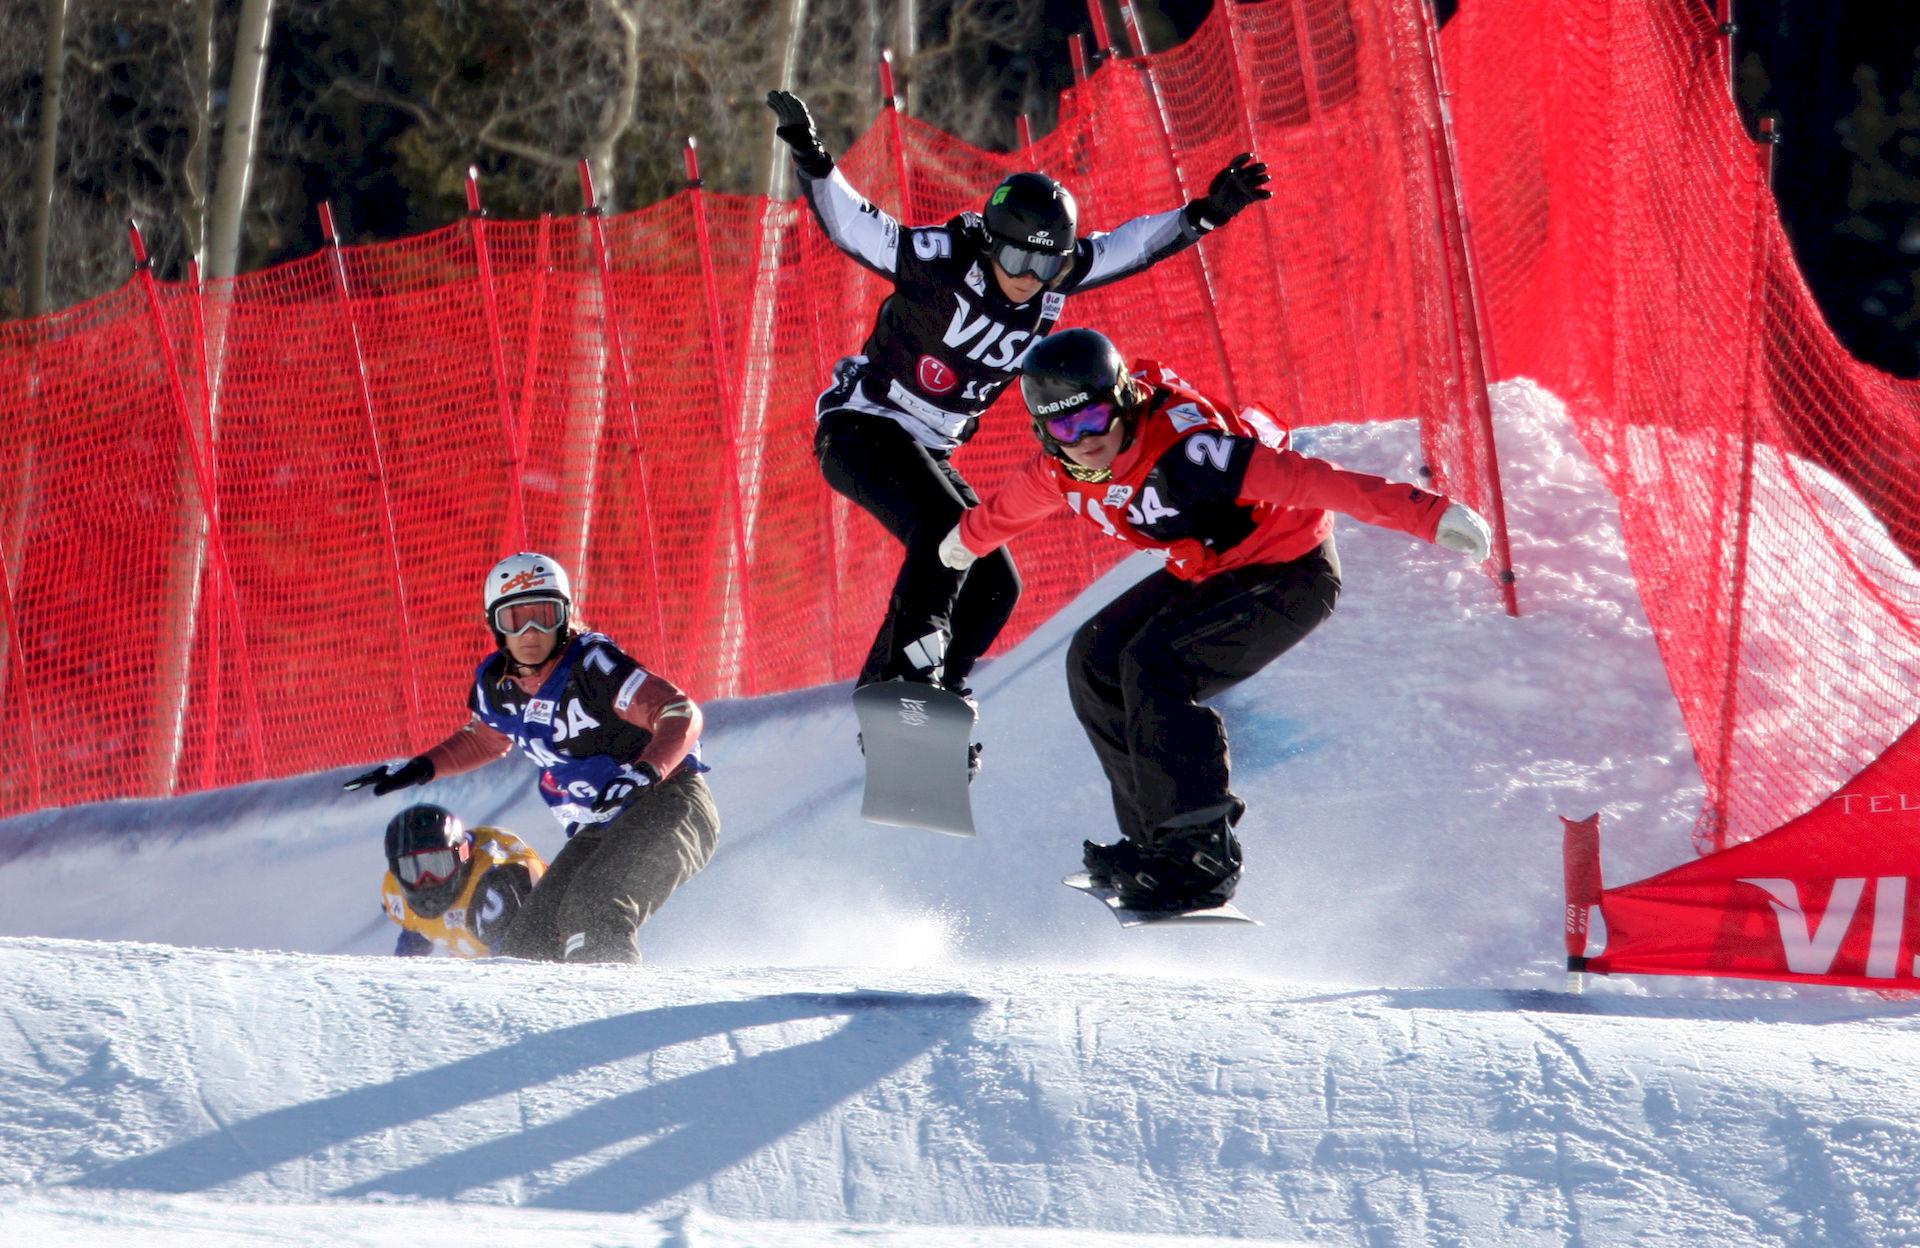 Photo of Tanja Frieden: Snowboarder